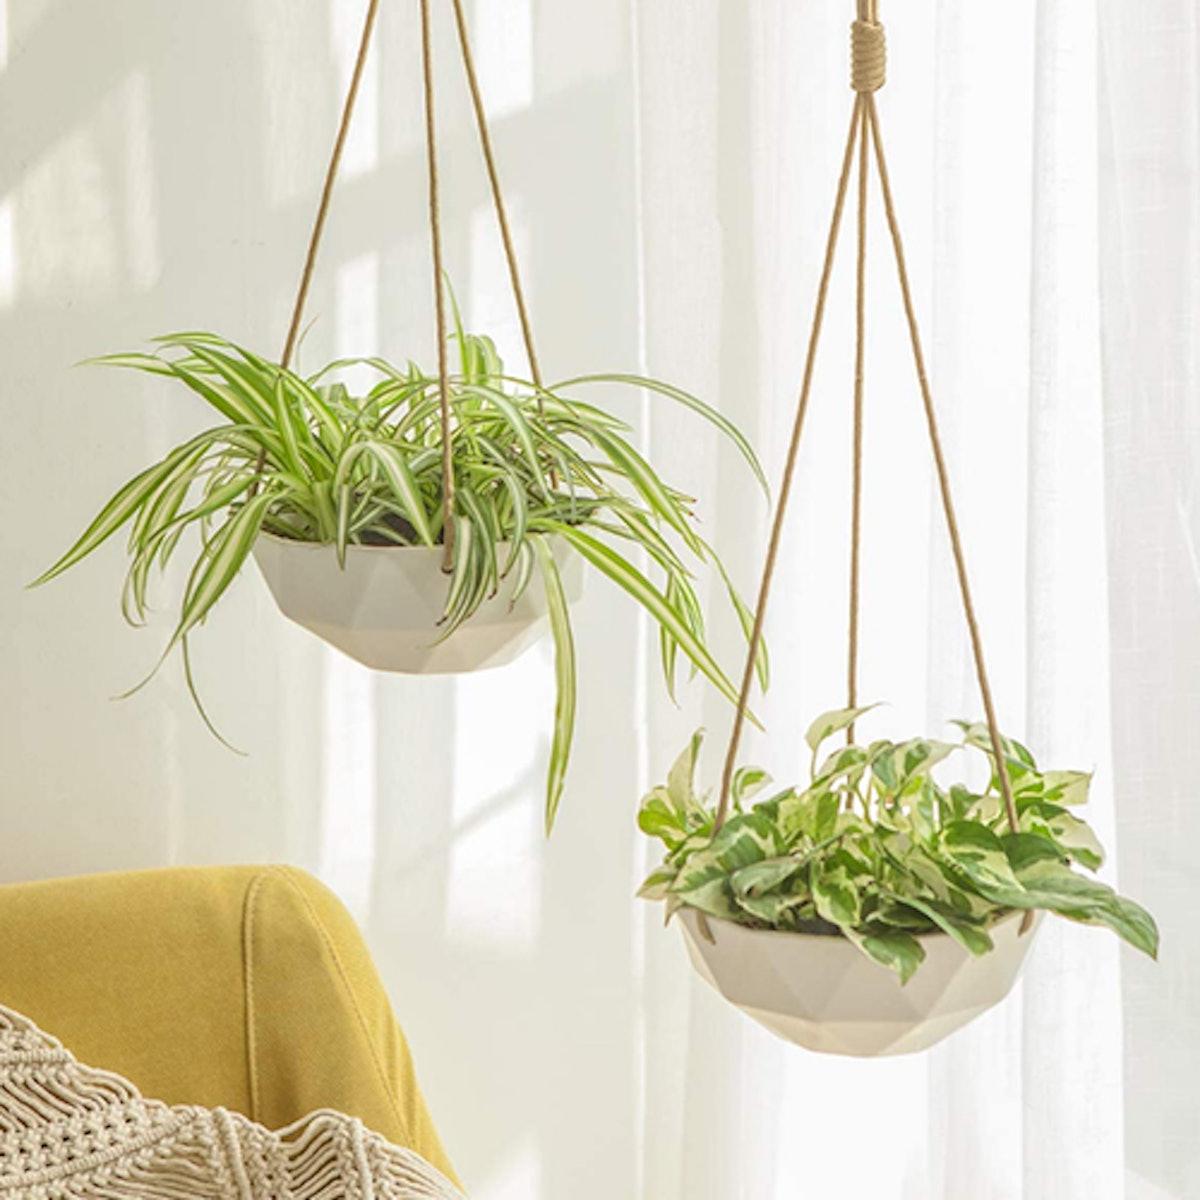 Mkono 9-Inch Ceramic Hanging Planter (2 Pieces)